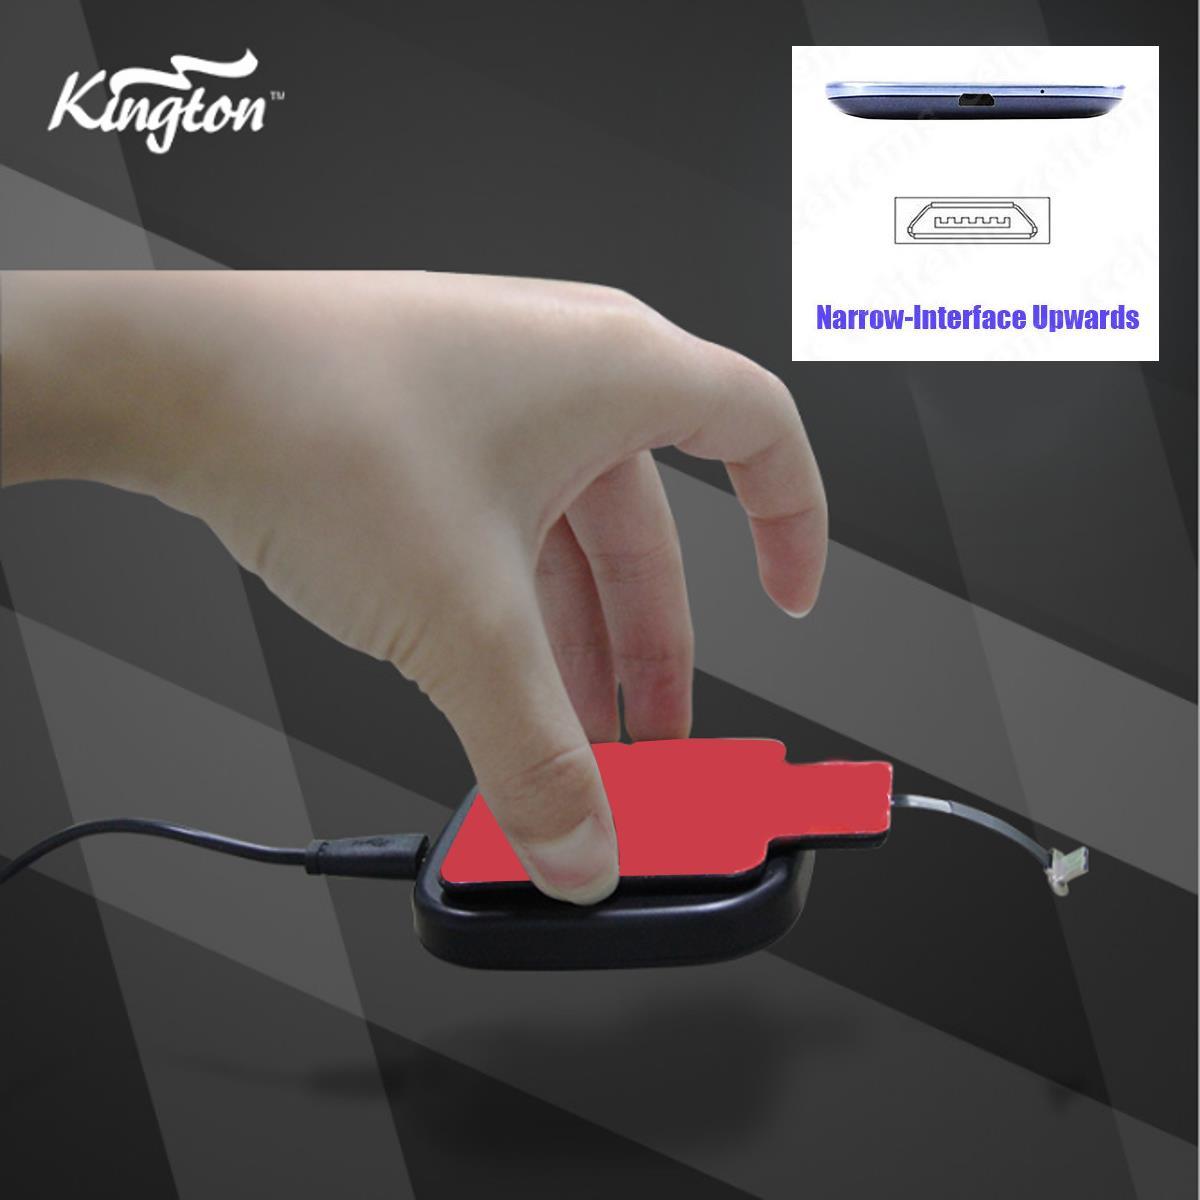 Bakeey Micro USB Qi Беспроводное зарядное устройство Приемник Для Redmi 5 Plus Примечание 5 4 4X S7 S6 - фото 1